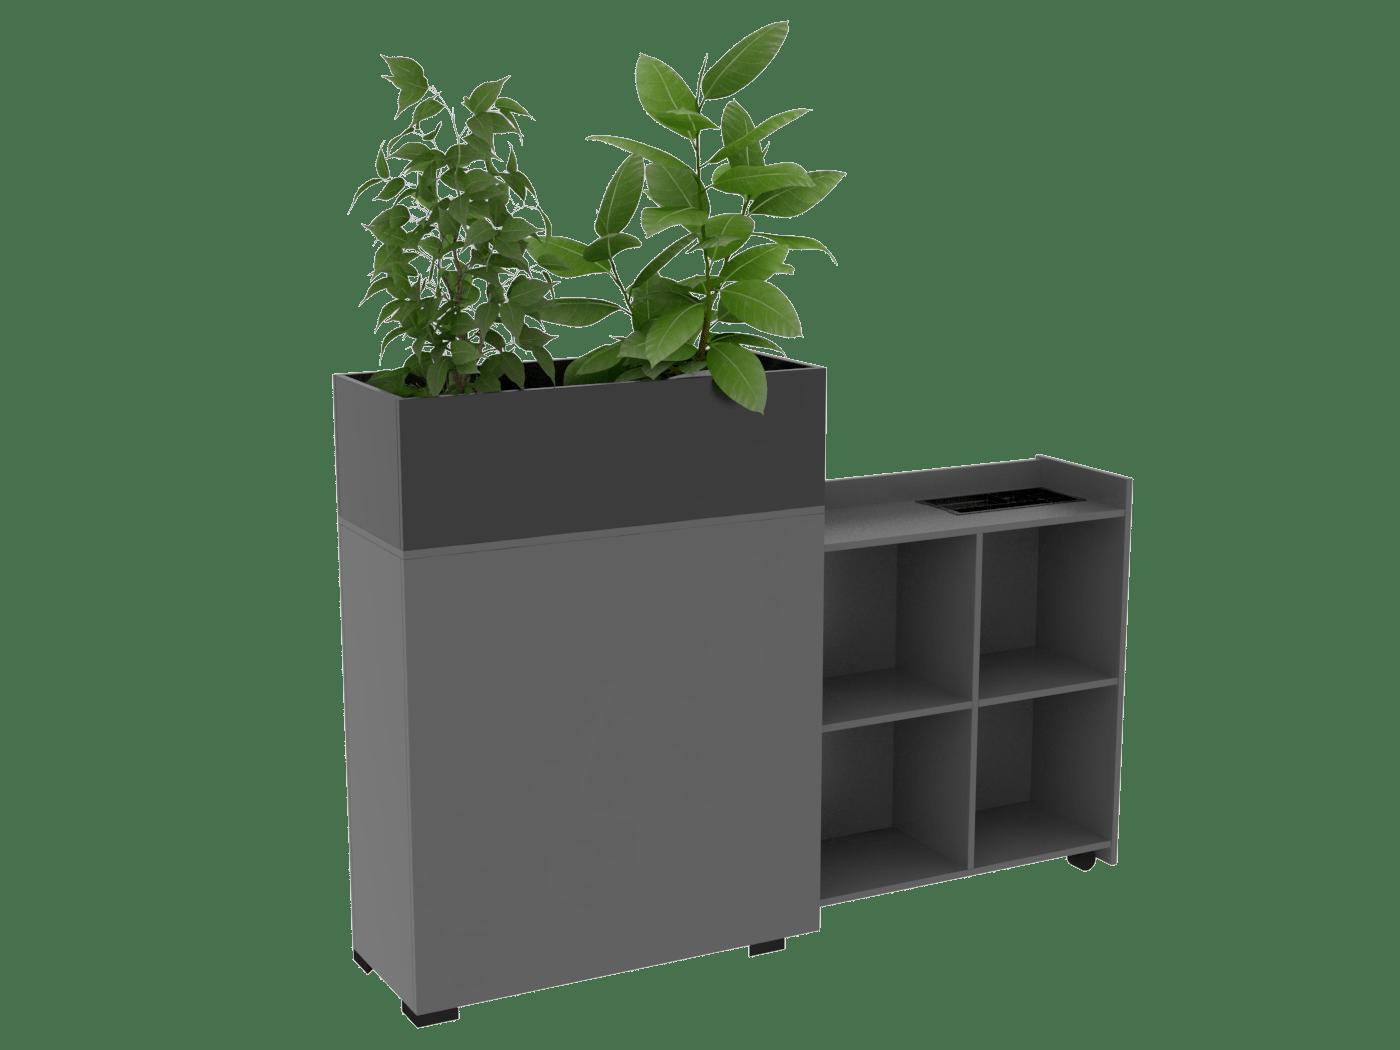 Plantekasse_02